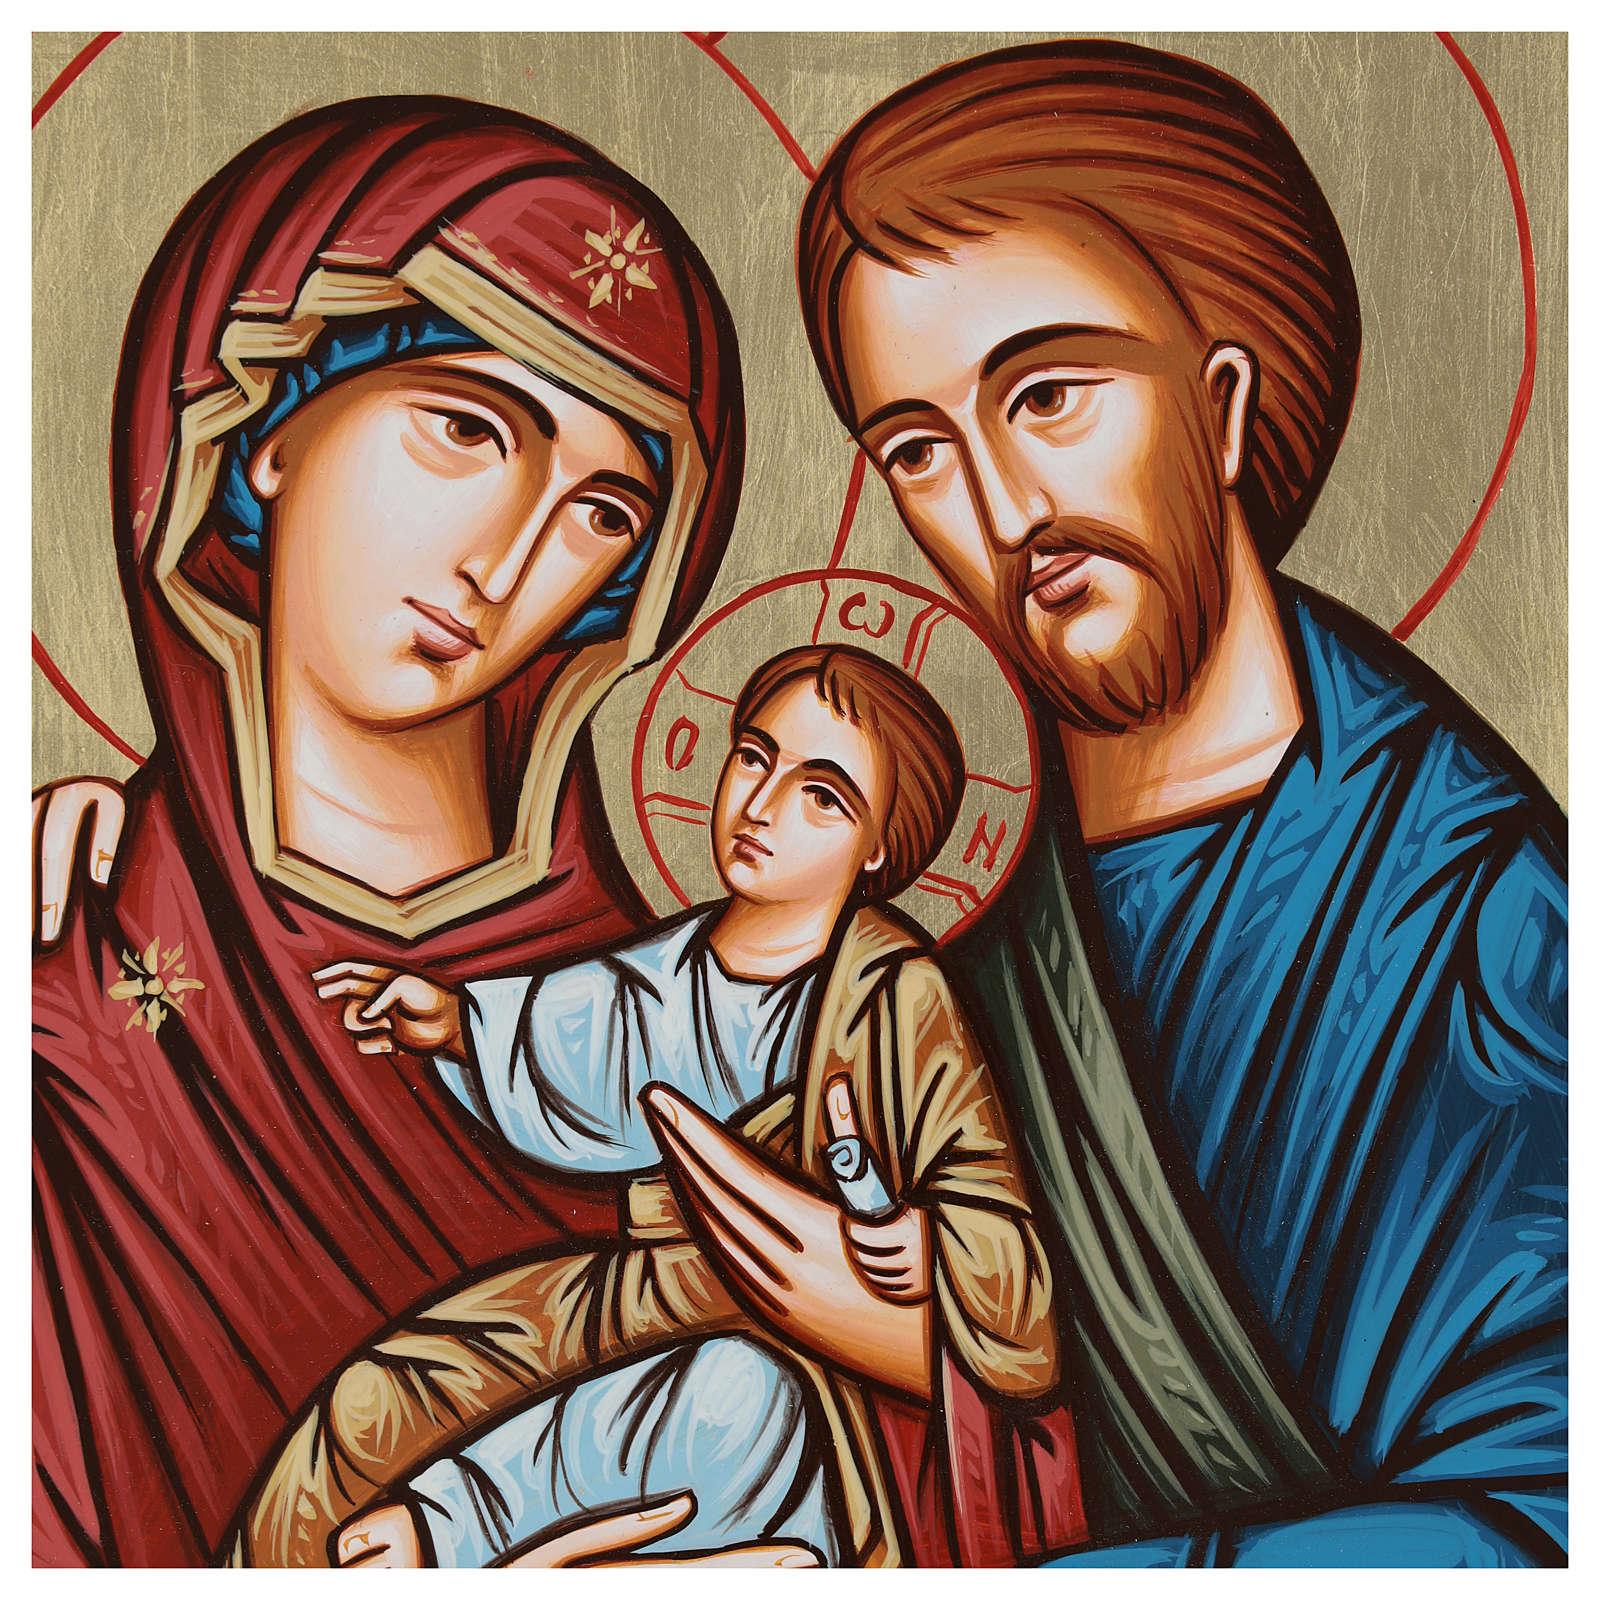 Sagrada Familia borde surcado 4